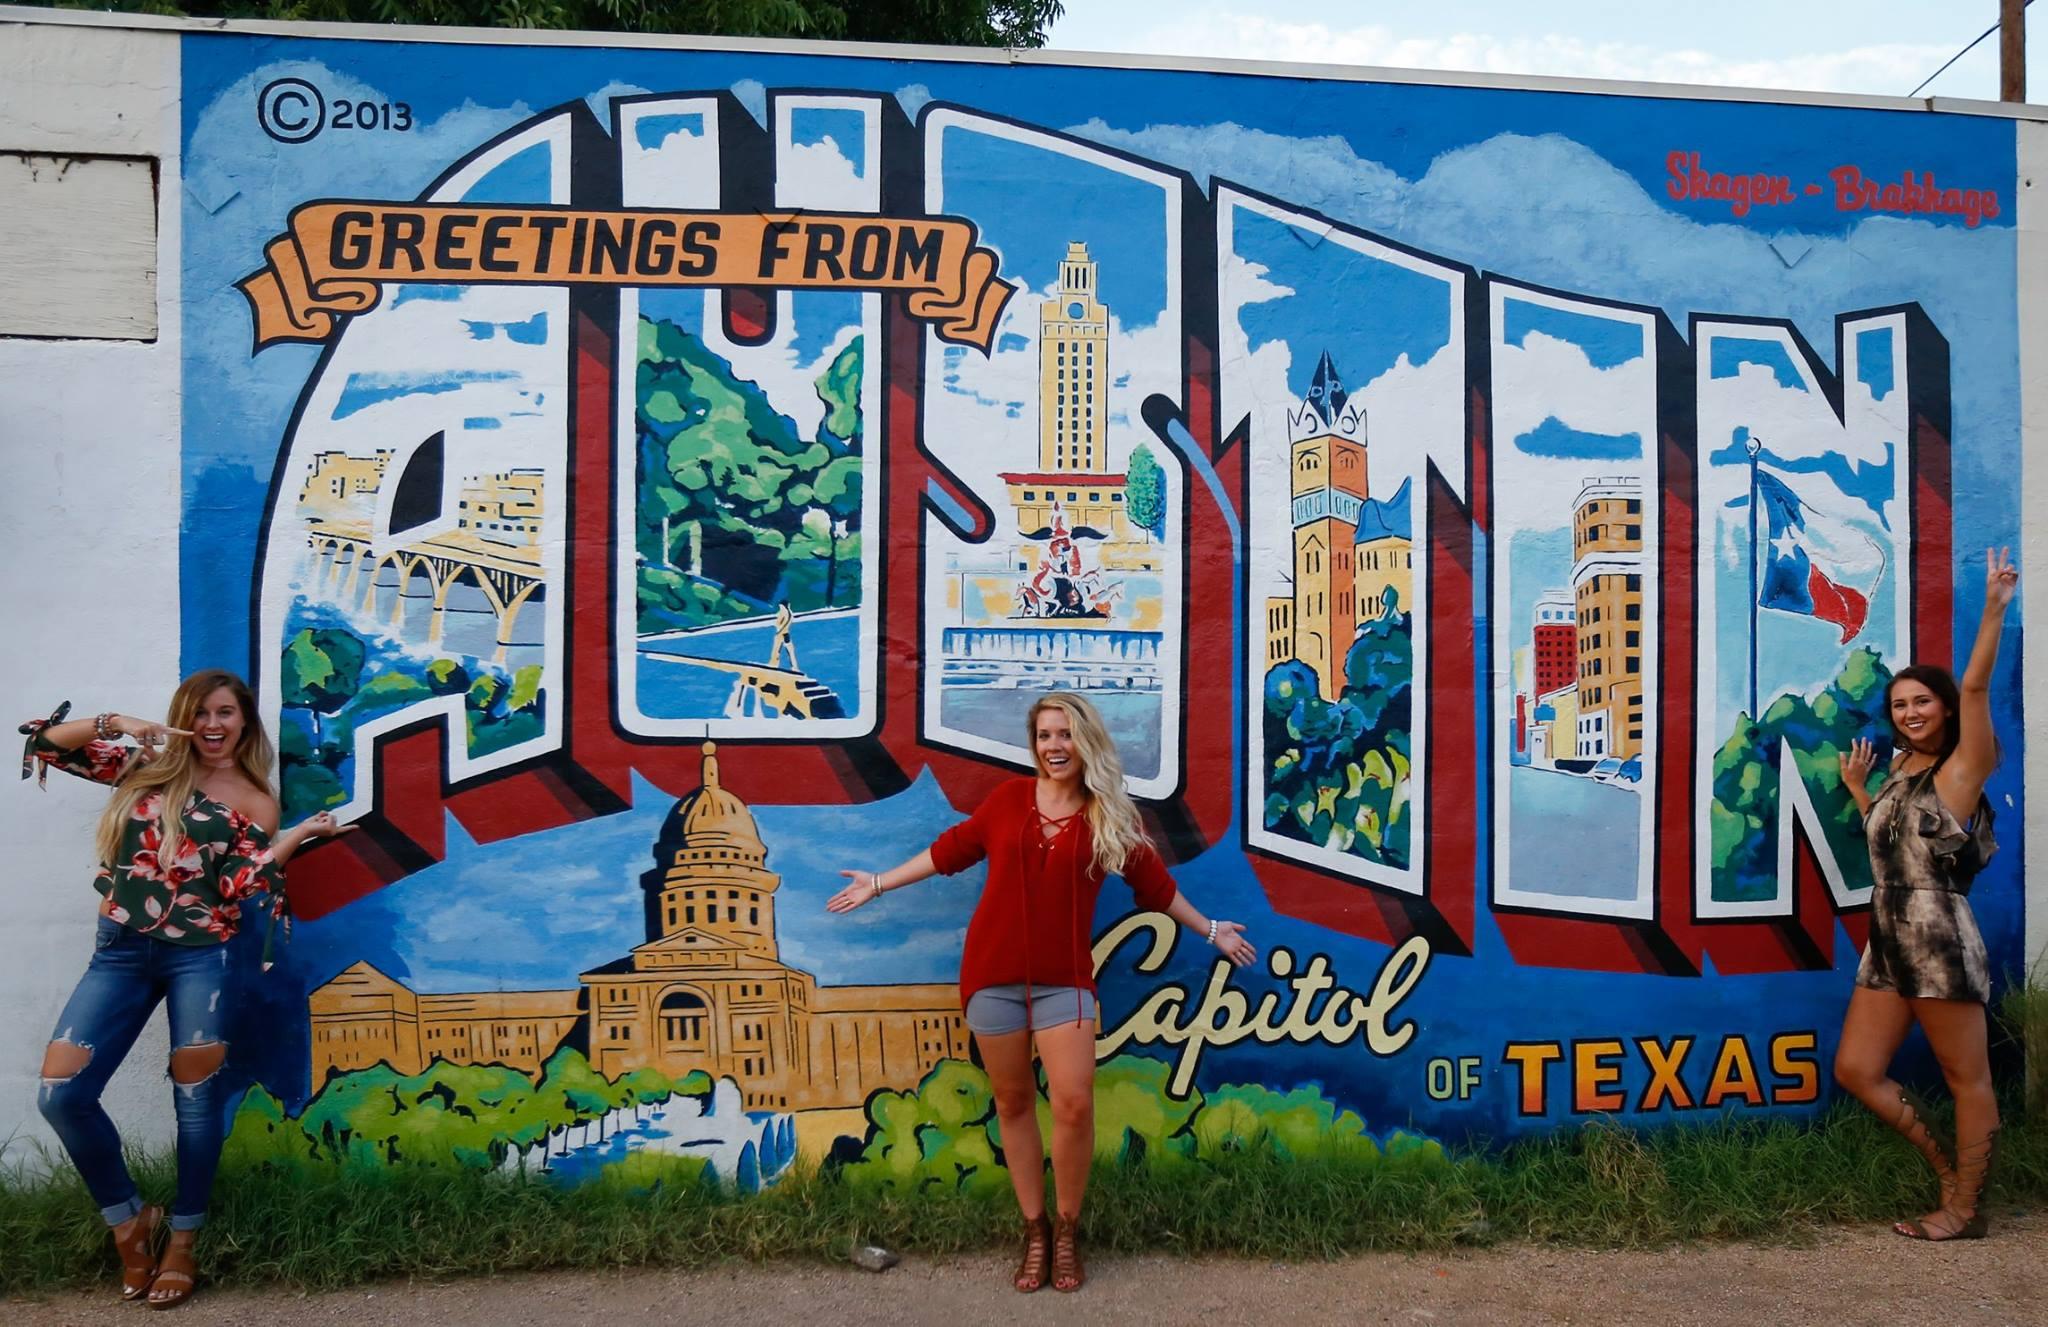 Austin, TX - View Photos